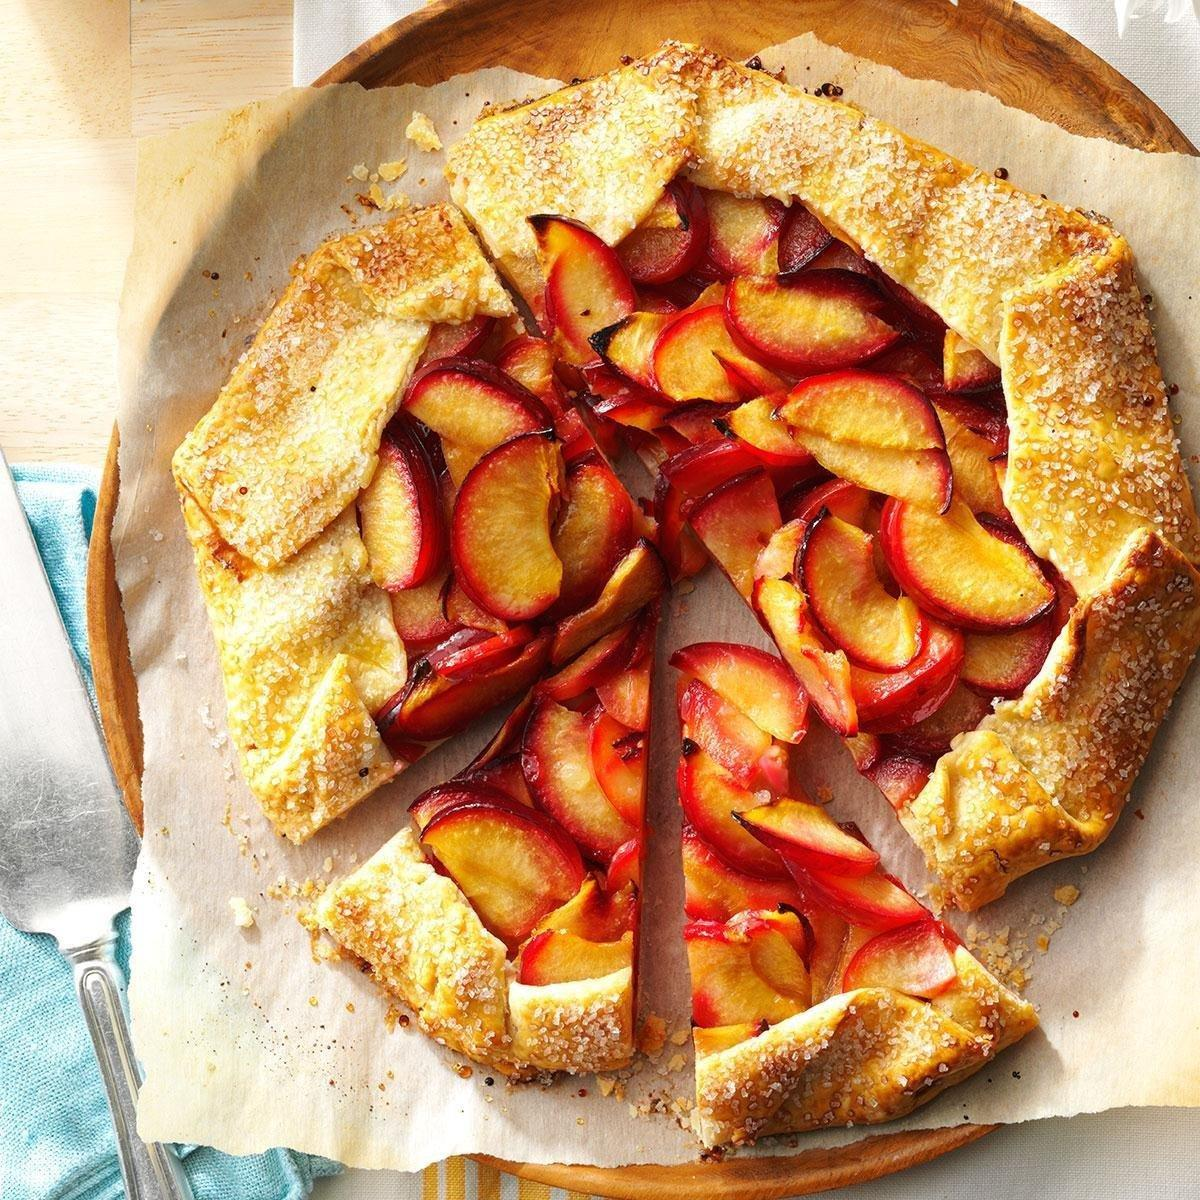 95 Diabetic-friendly Desserts